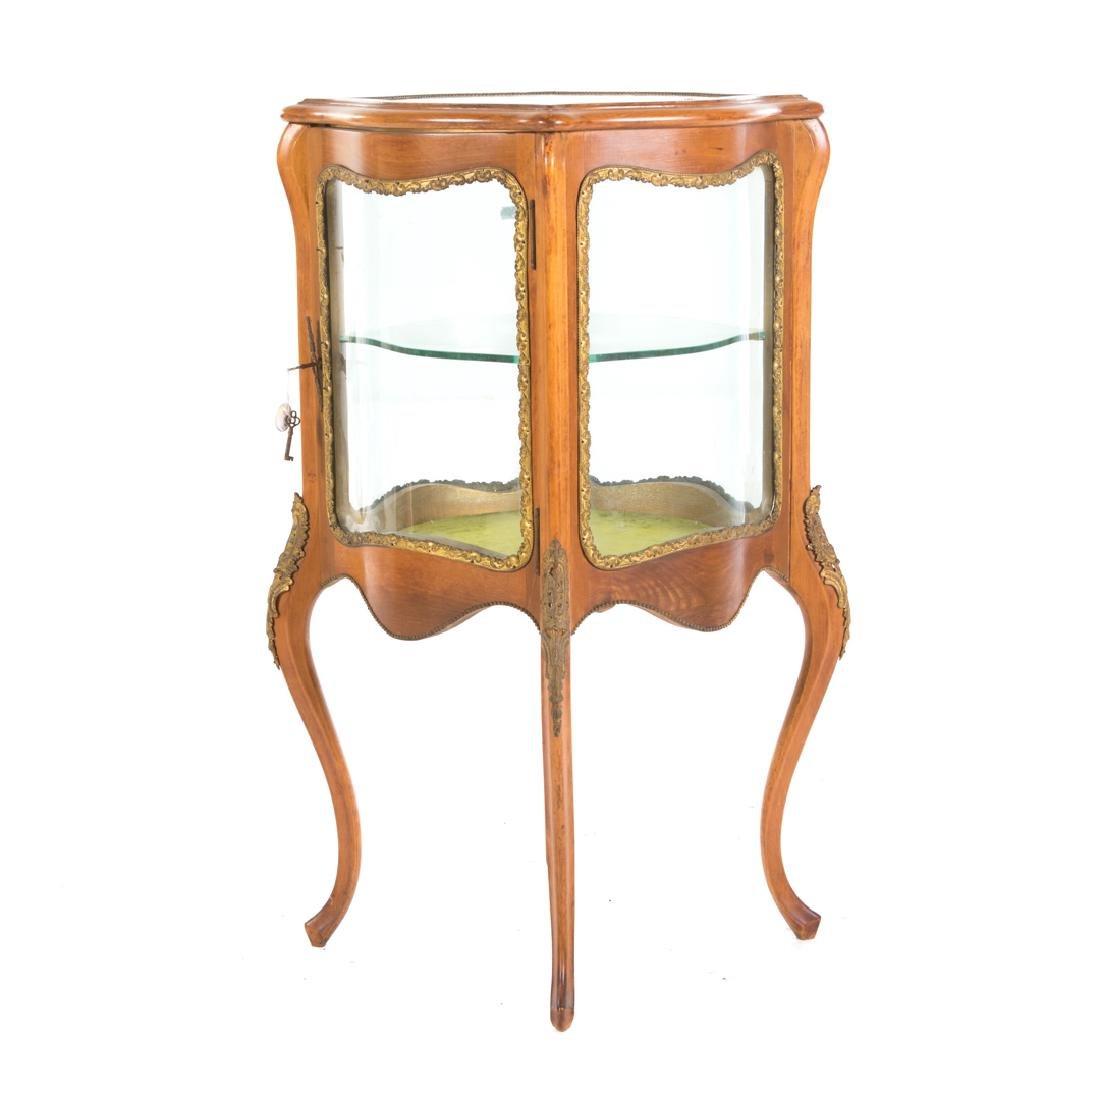 Louis XV style fruitwood brass mounted vitrine - 2